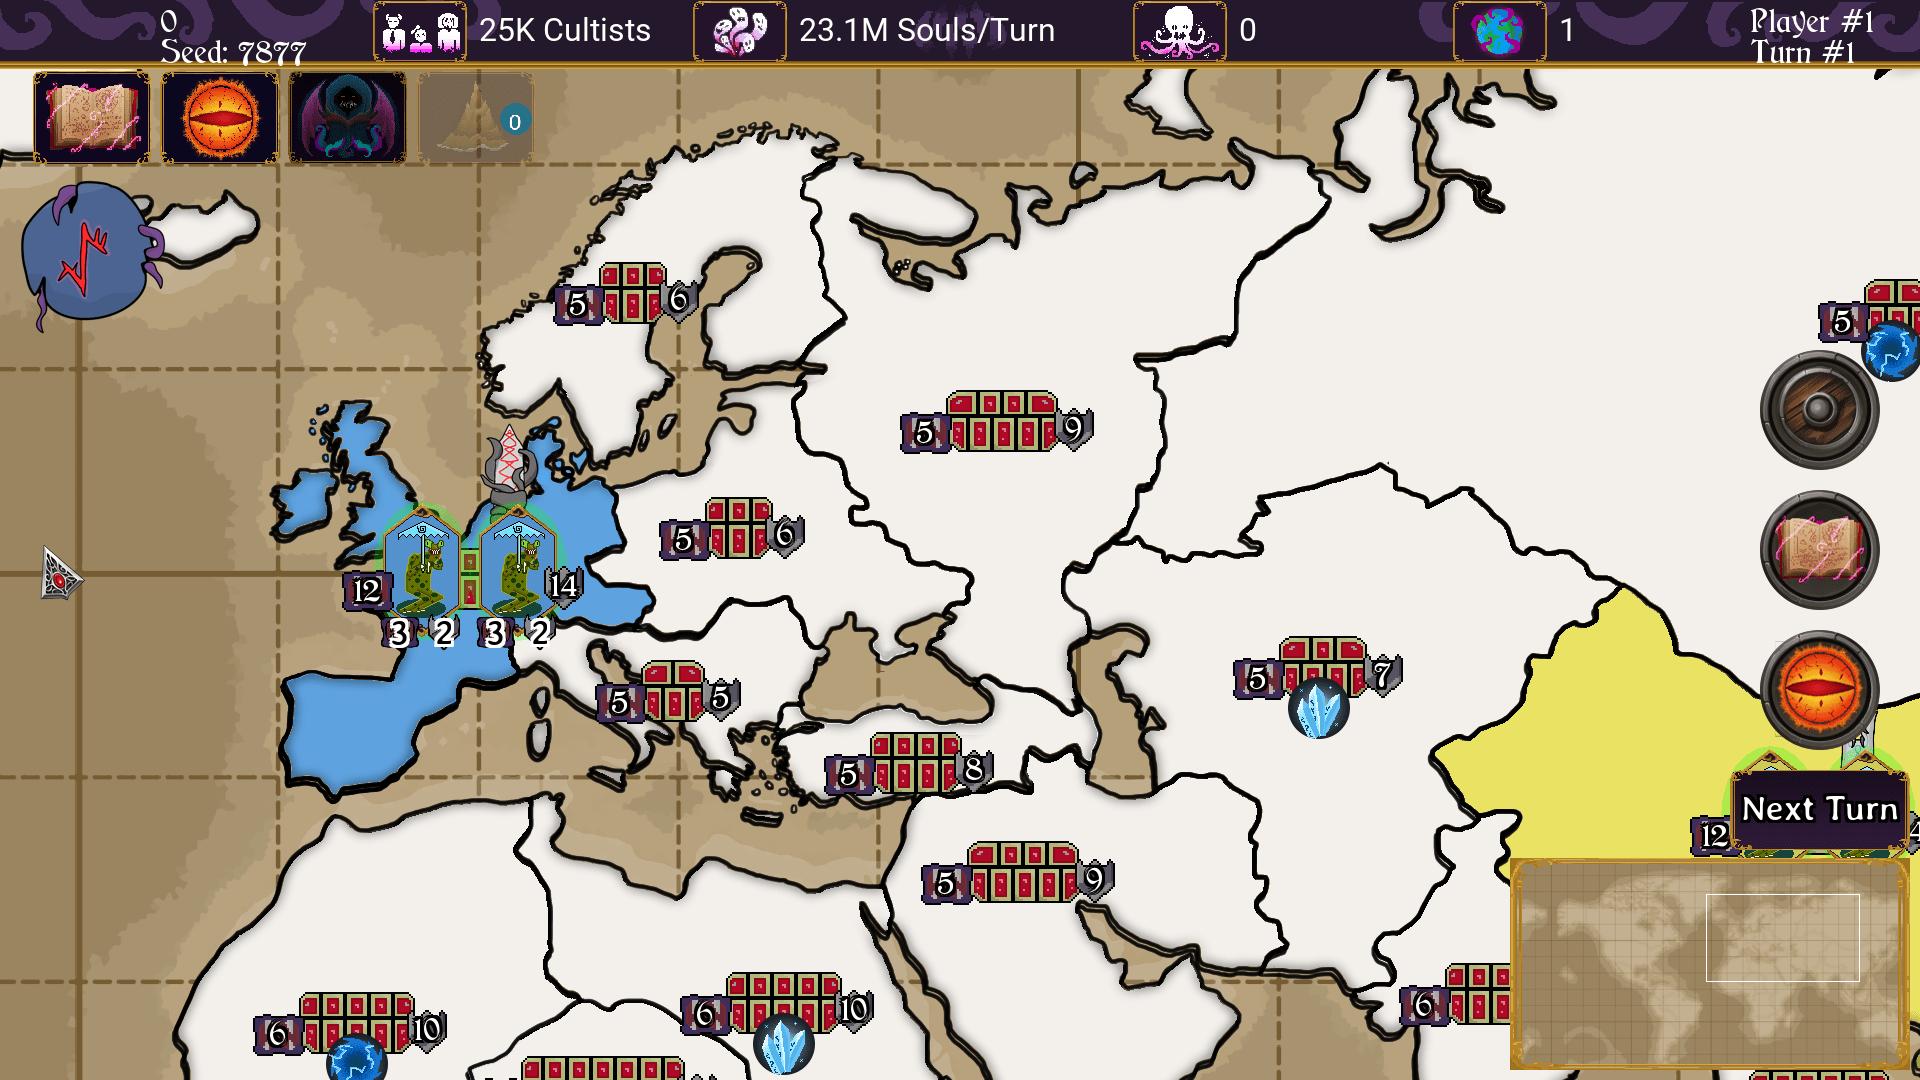 Cthulhu's Catharsis game screenshot, map